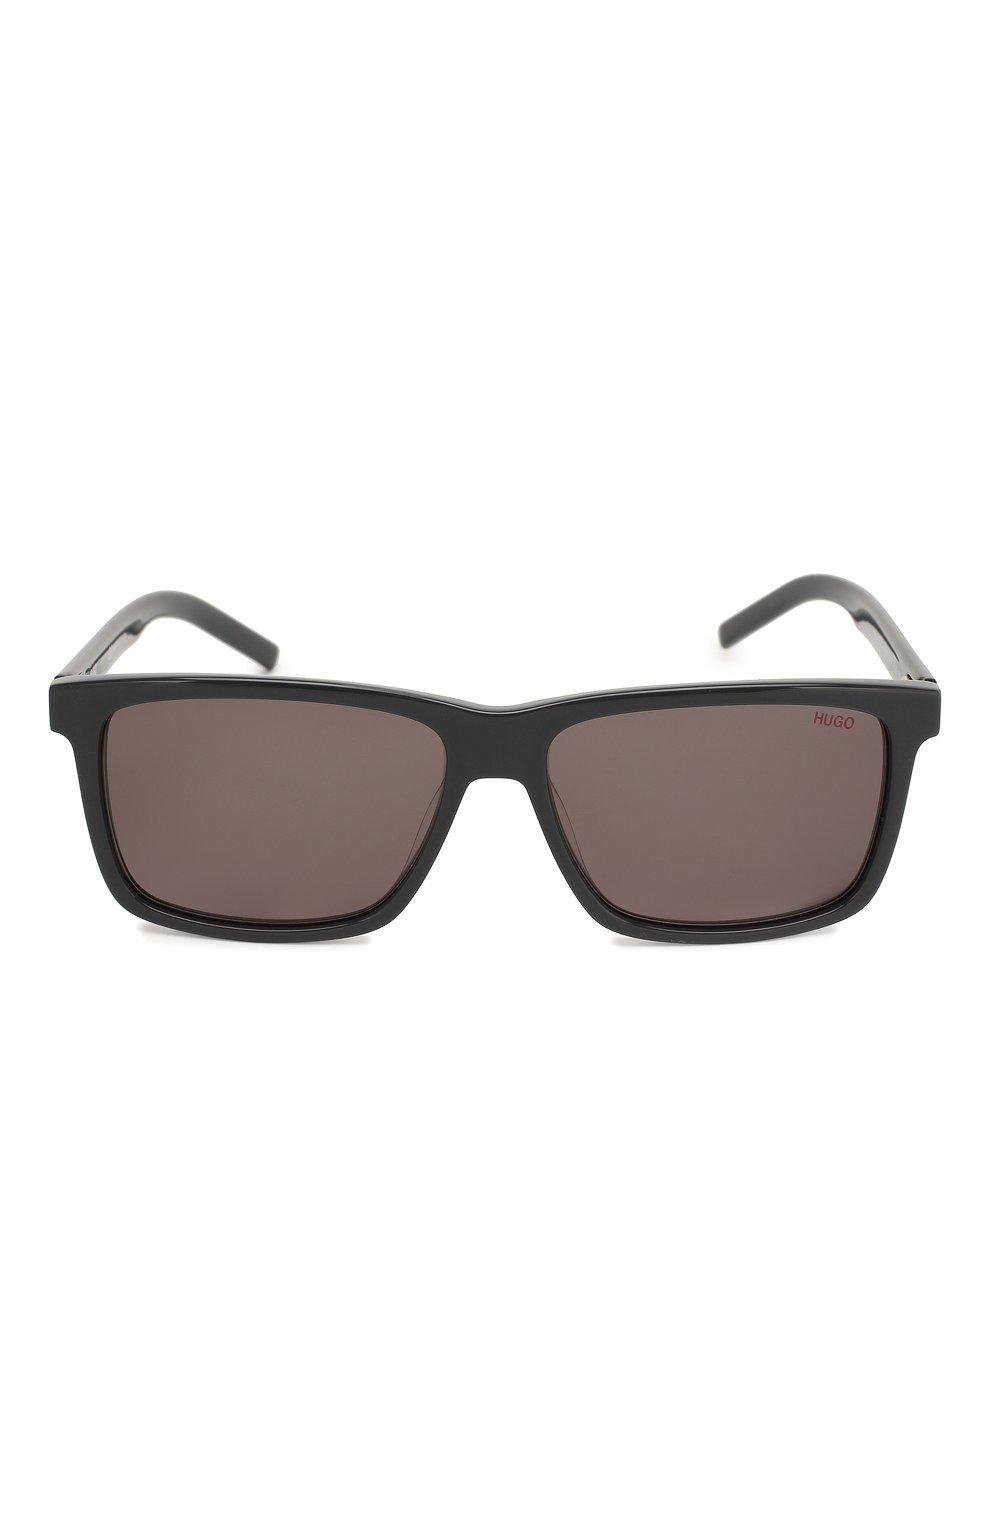 Мужские солнцезащитные очки BOSS темно-серого цвета, арт. 1013 KB7   Фото 2